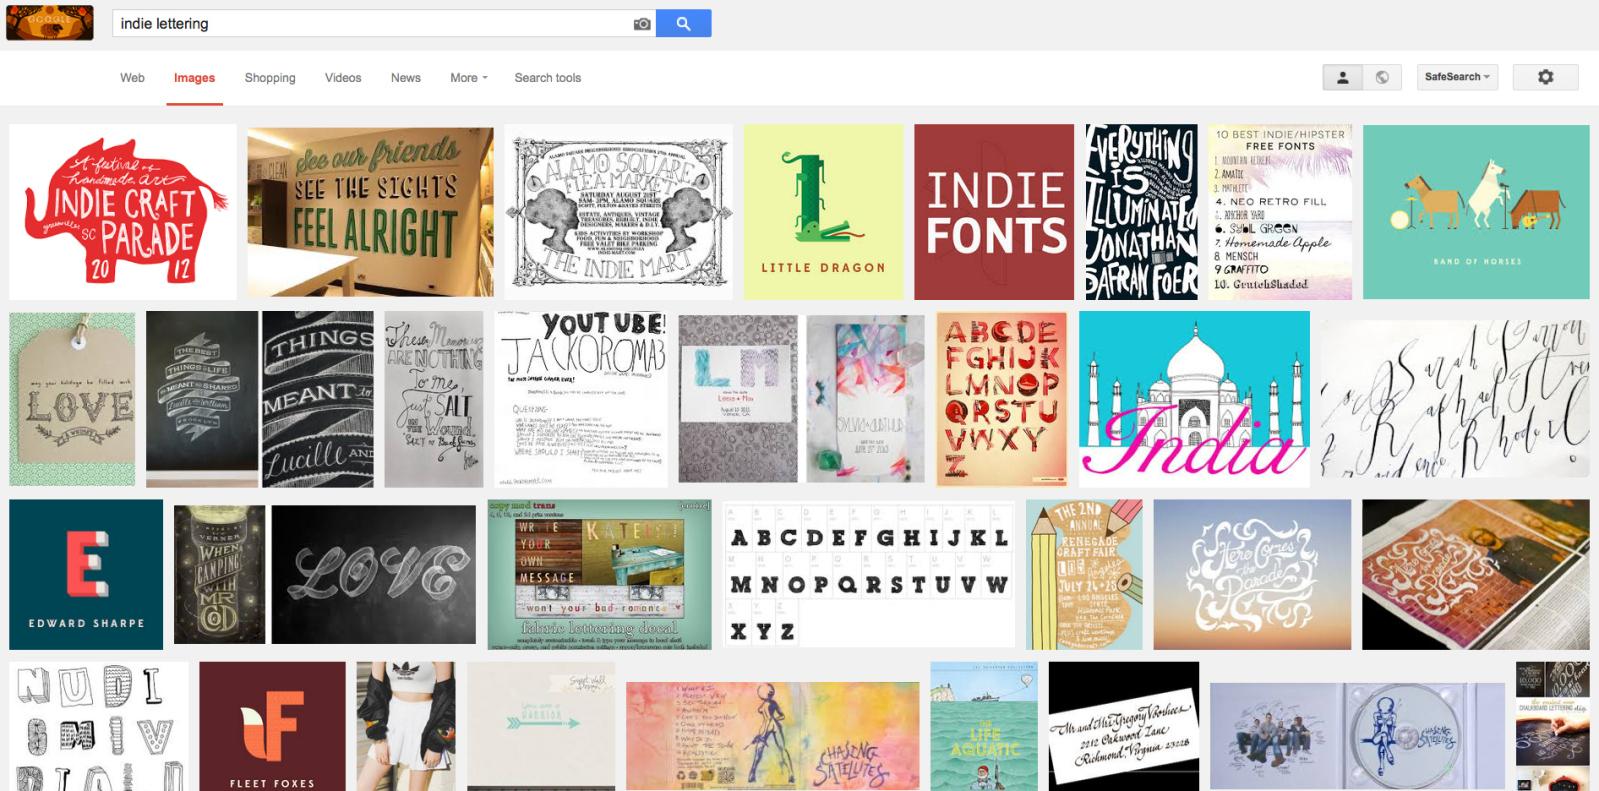 IndieLettering_Google.jpg